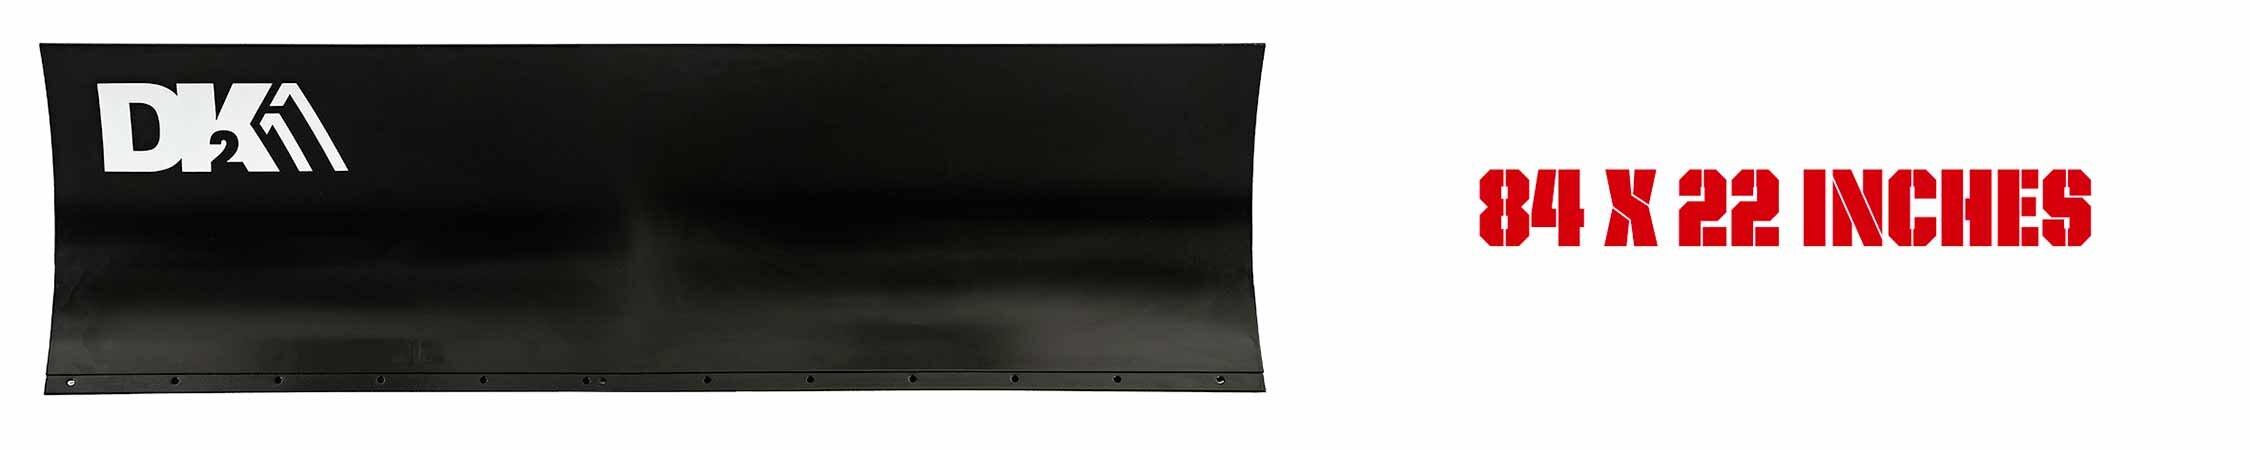 DK2-Personal-Snow-Plow-Blade-Size-84x22.jpg